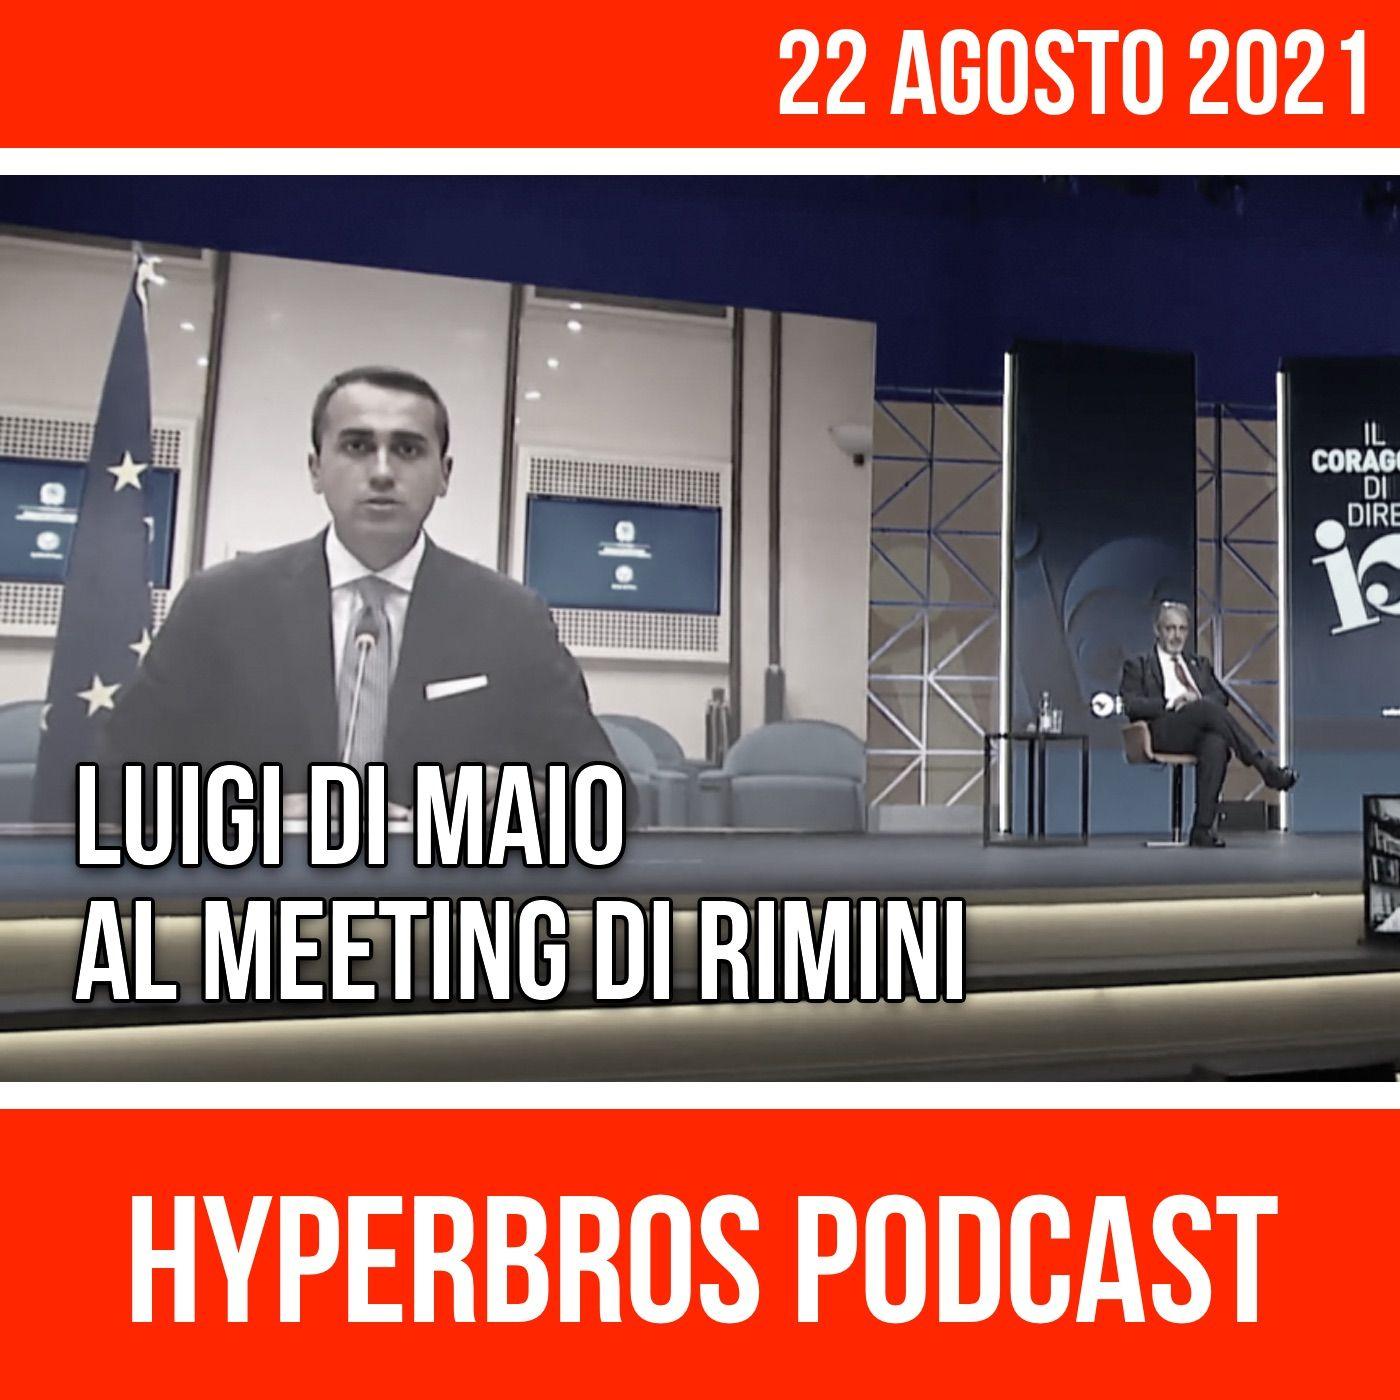 Luigi Di Maio al Meeting di Rimini